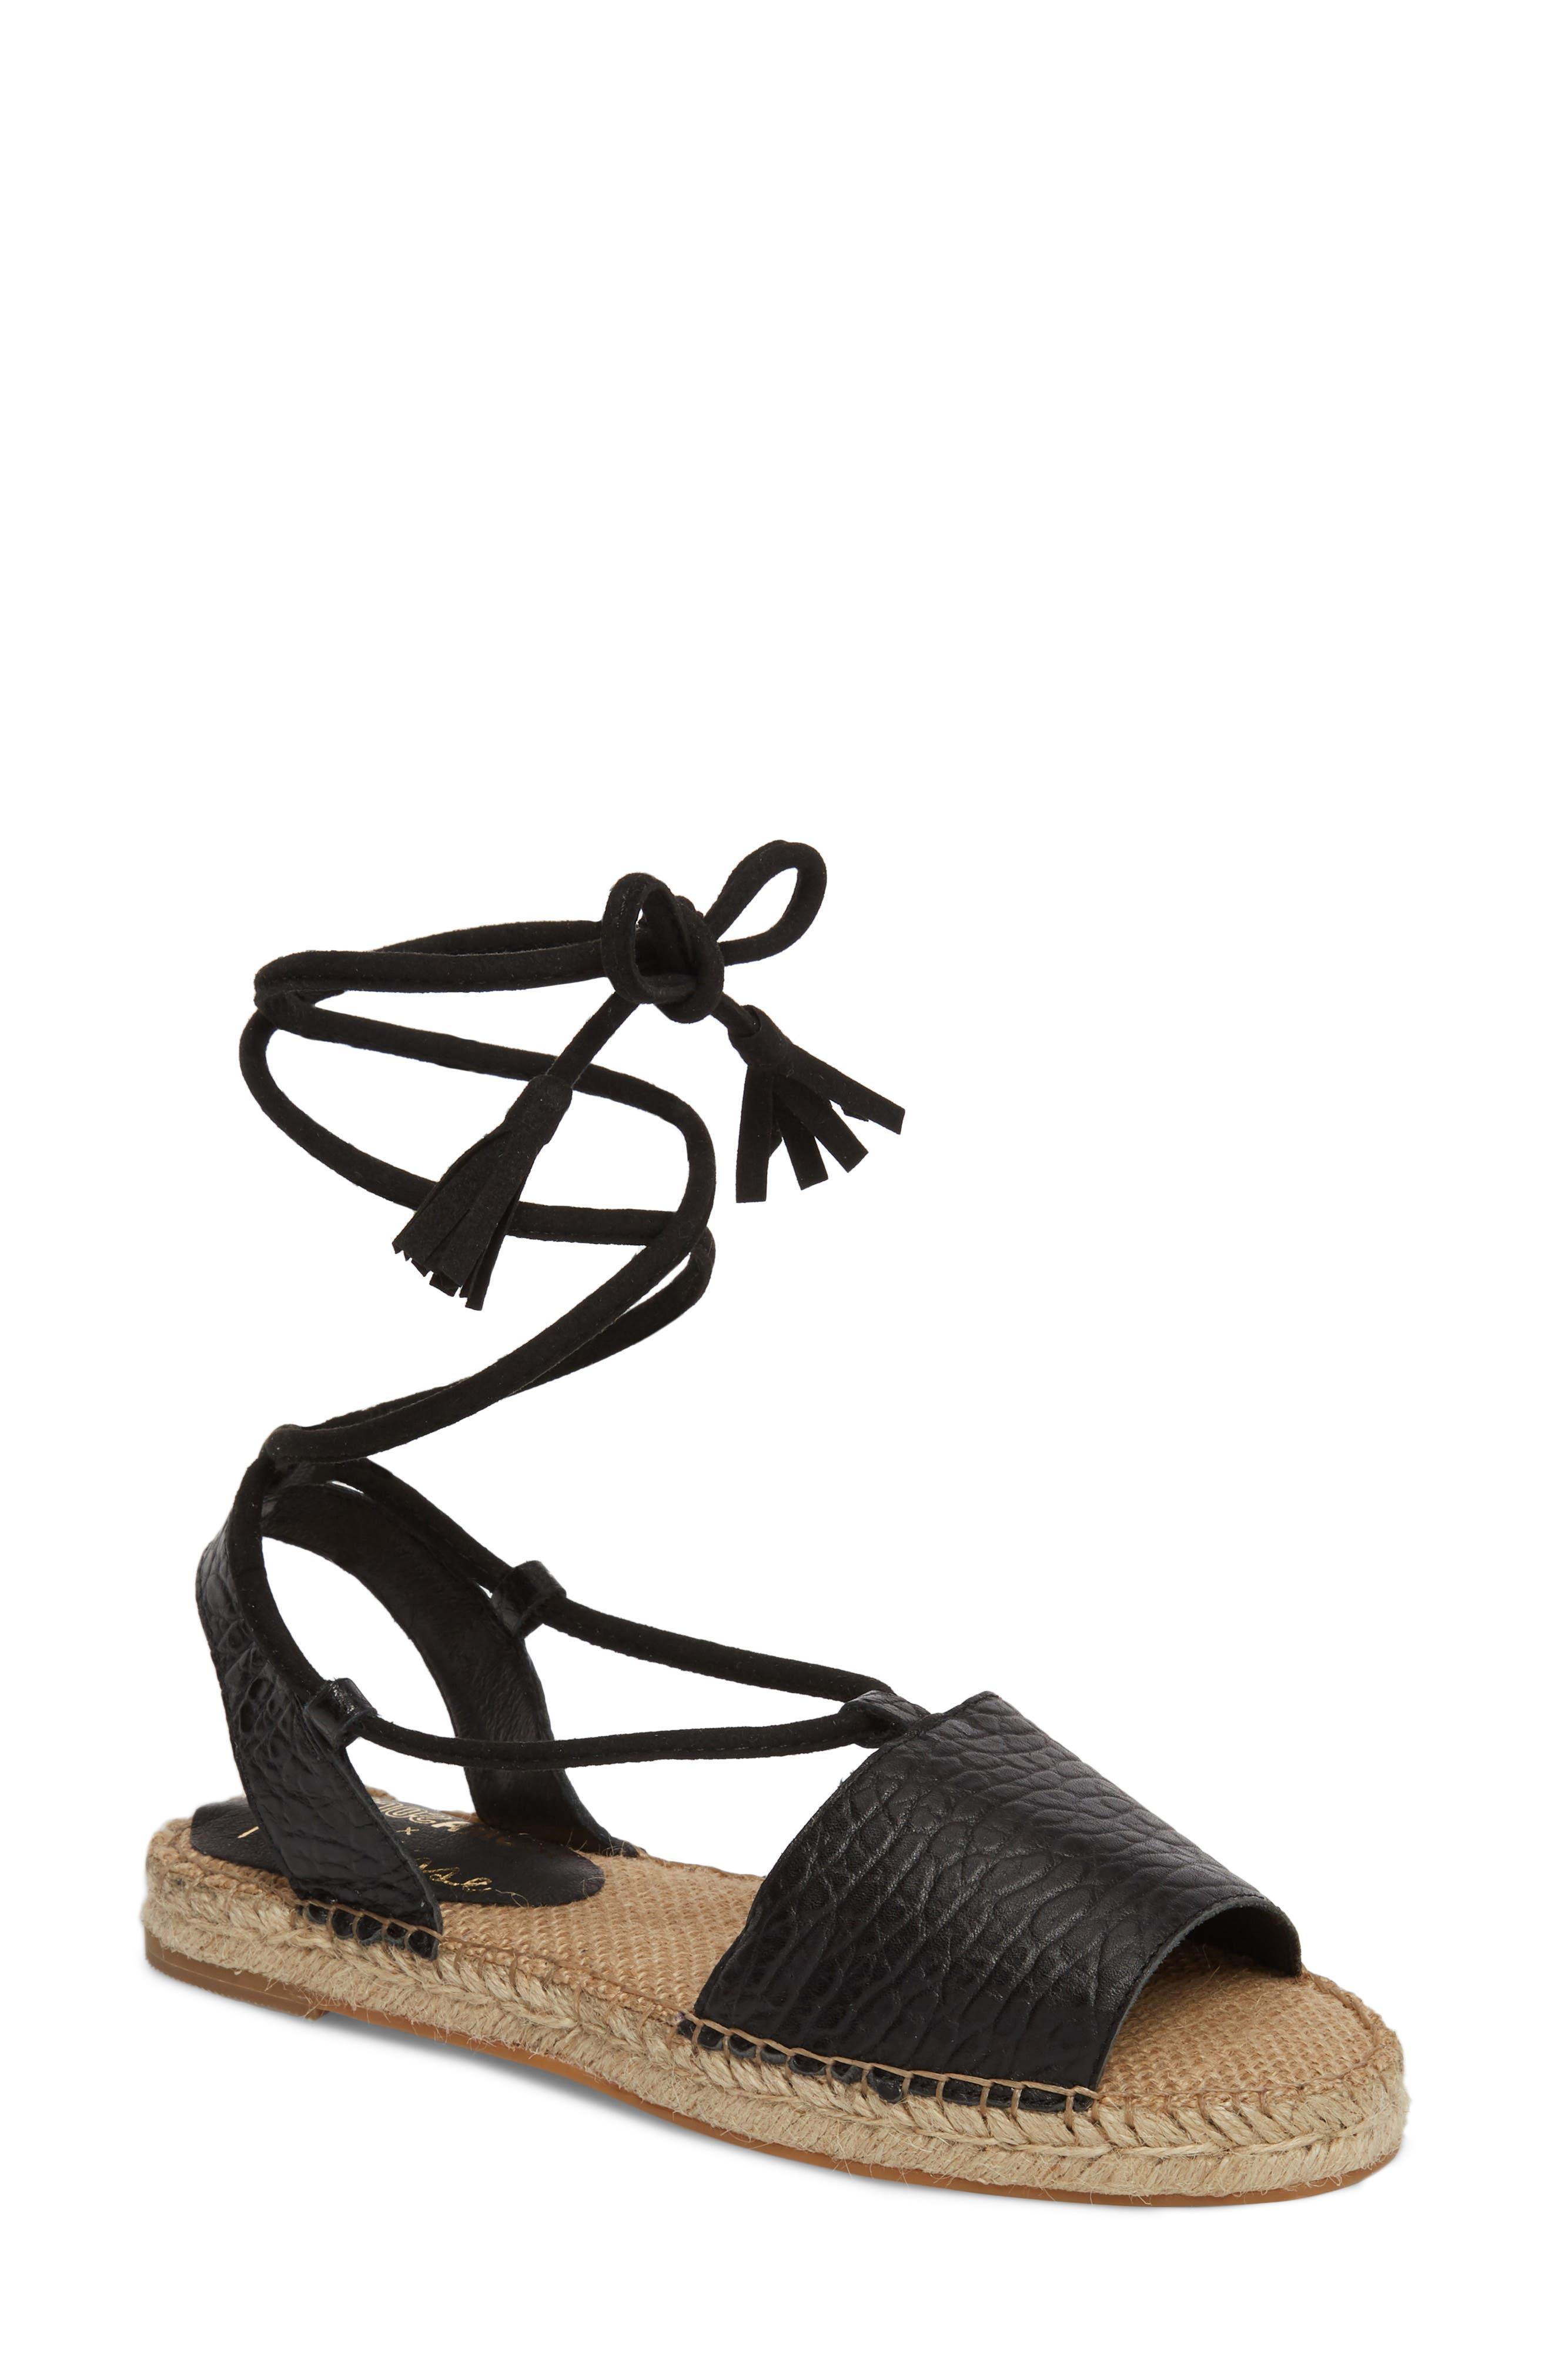 Amuse Society x Matisse La Vita Sandal,                         Main,                         color, BLACK LEATHER